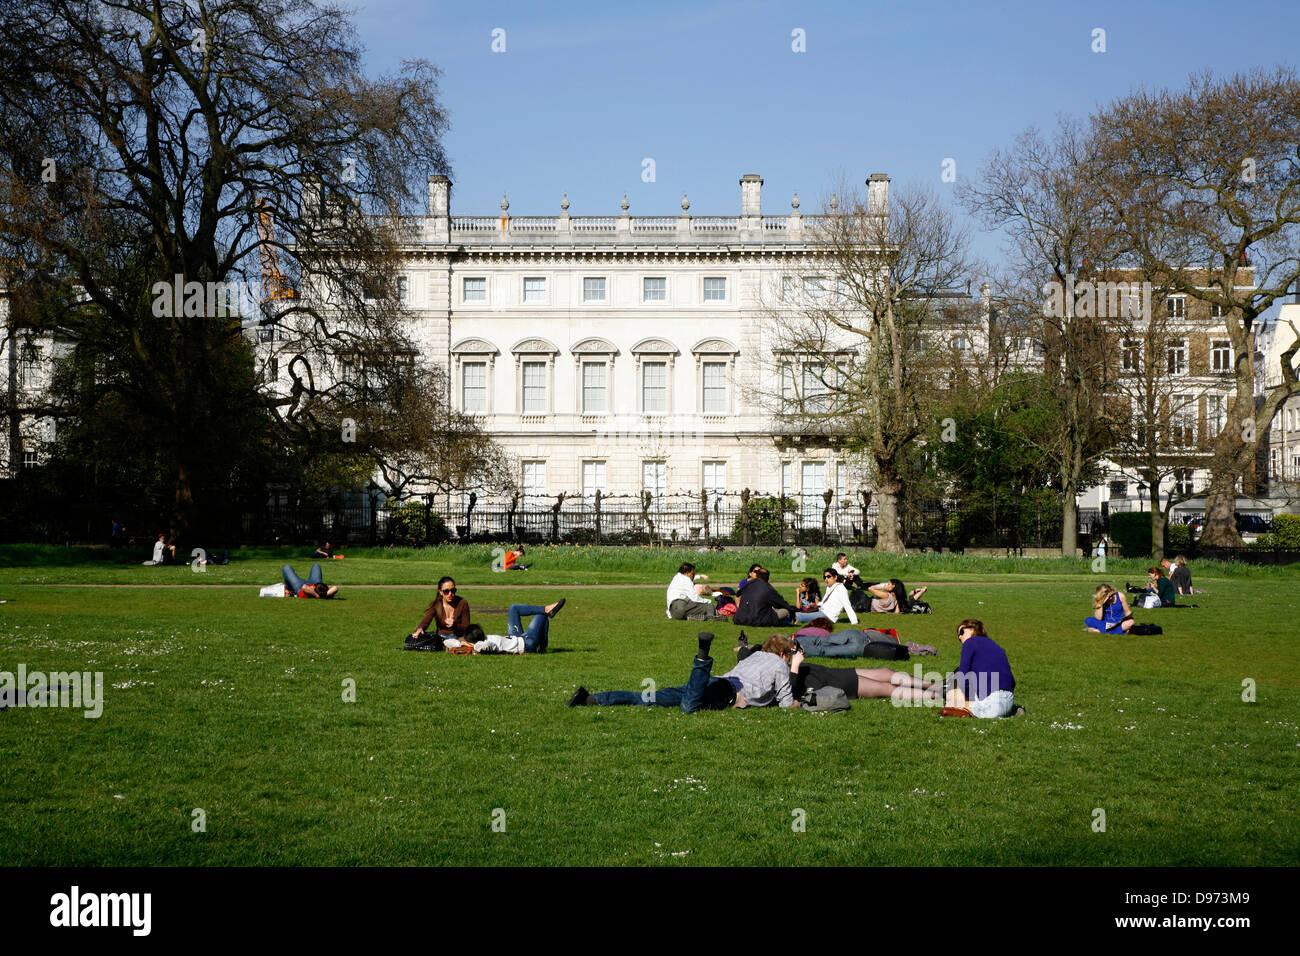 View through Green Park to Bridgewater House, St James's, London, UK - Stock Image